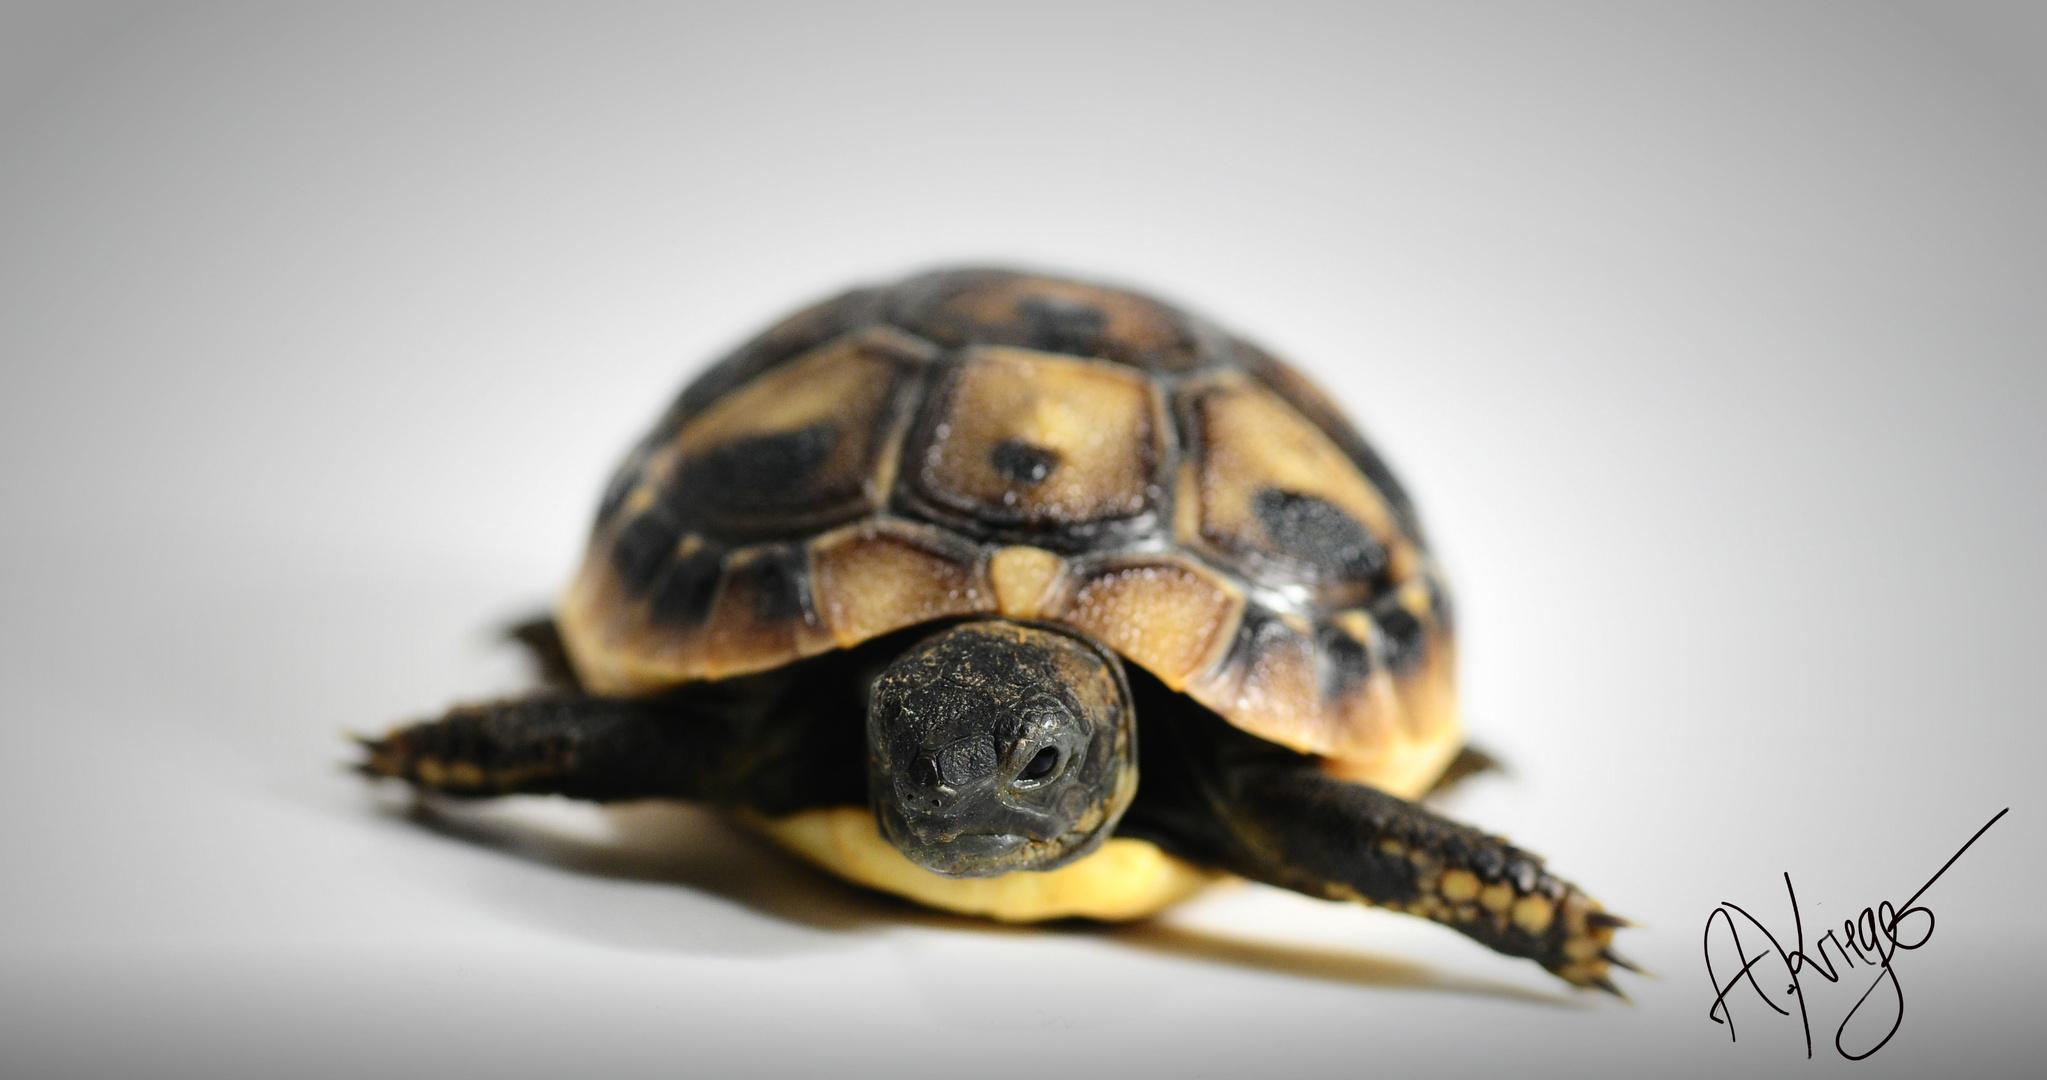 Land Schildkröte (testudo hermanni böttgeri)